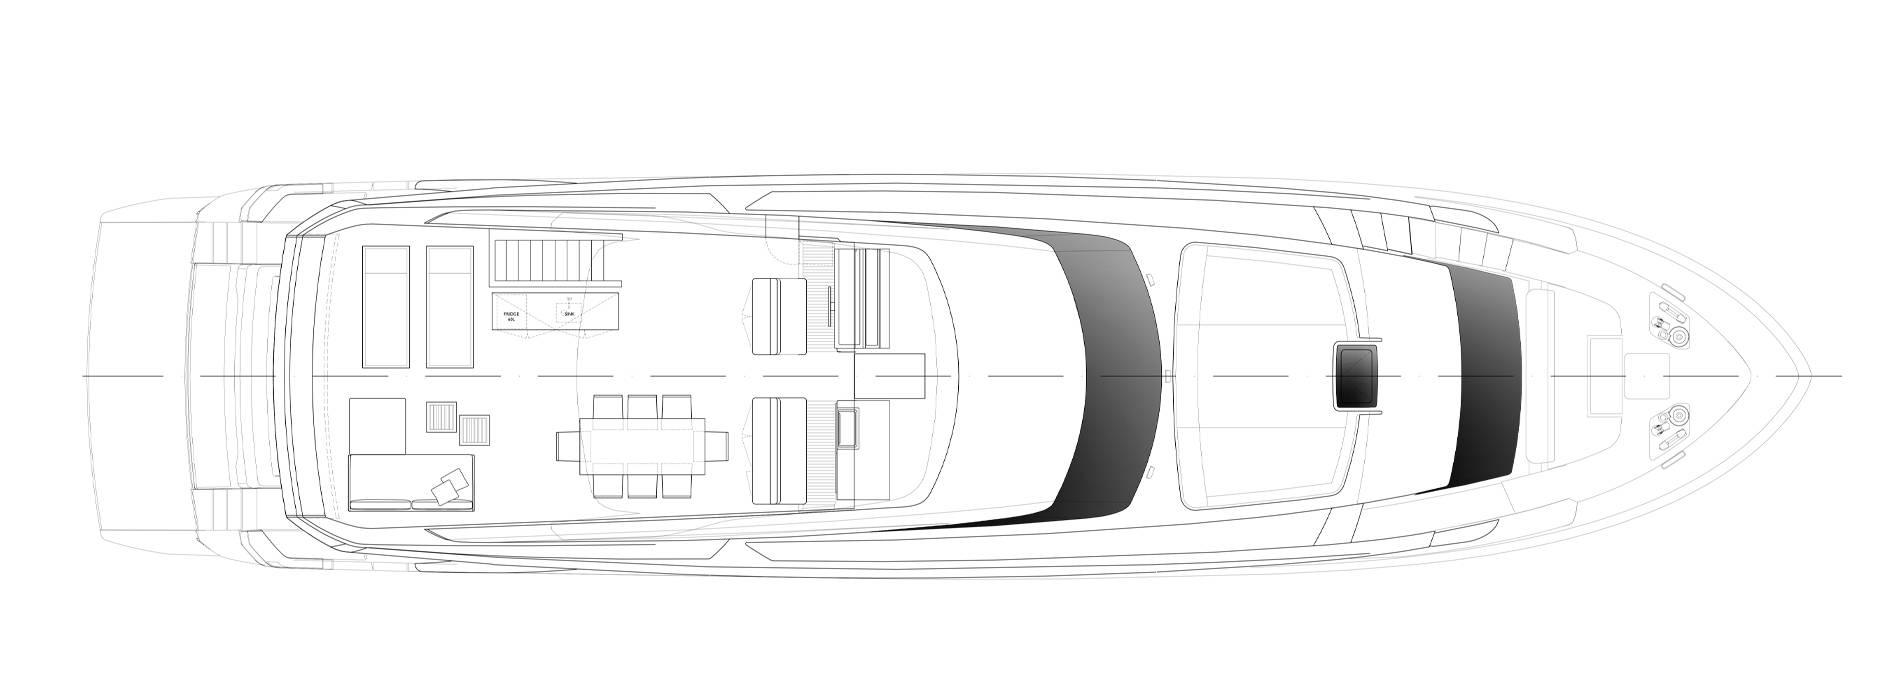 Sanlorenzo Yachts SL90 Asymmetric Флайбридж